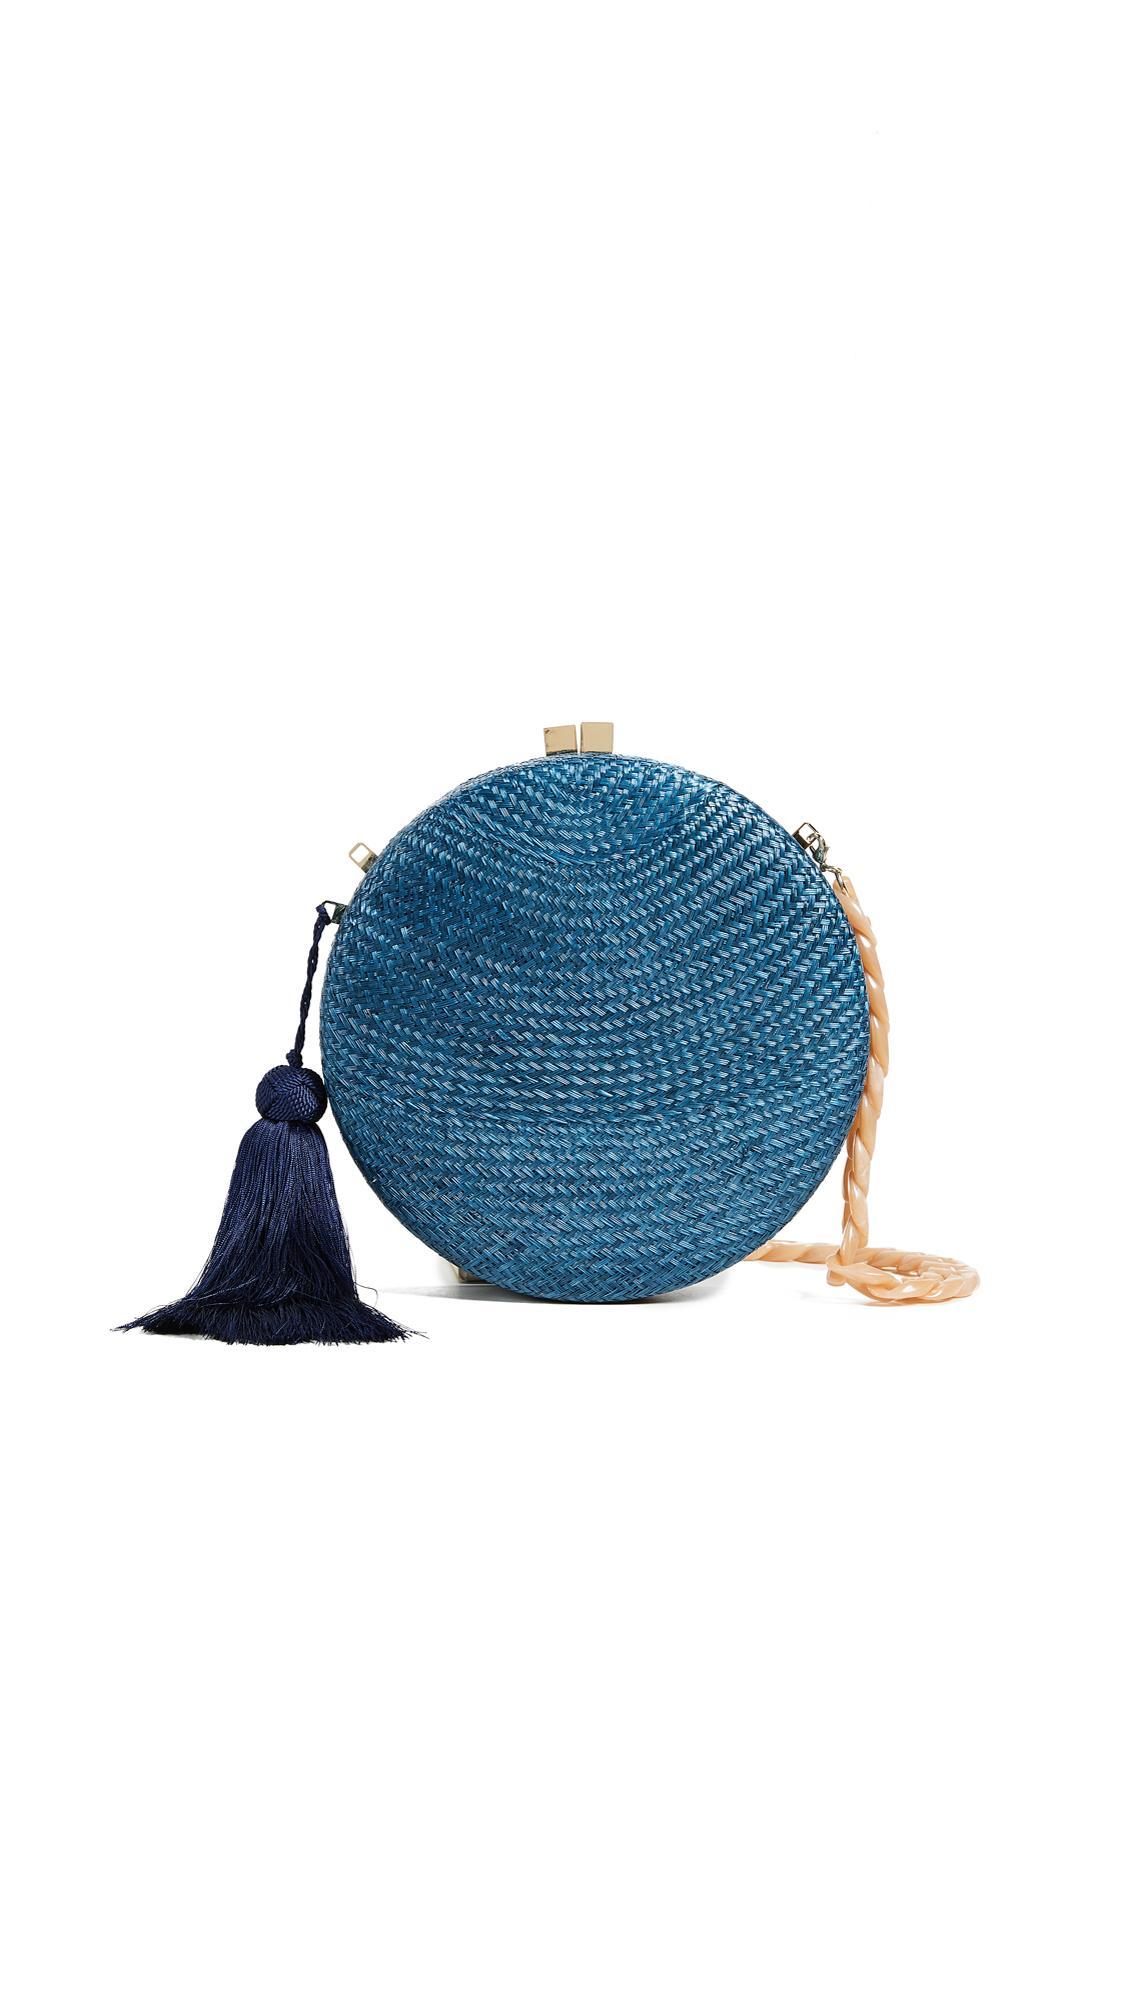 7d70f2689 Serpui Marie Adele Round Clutch In Navy Blue | ModeSens